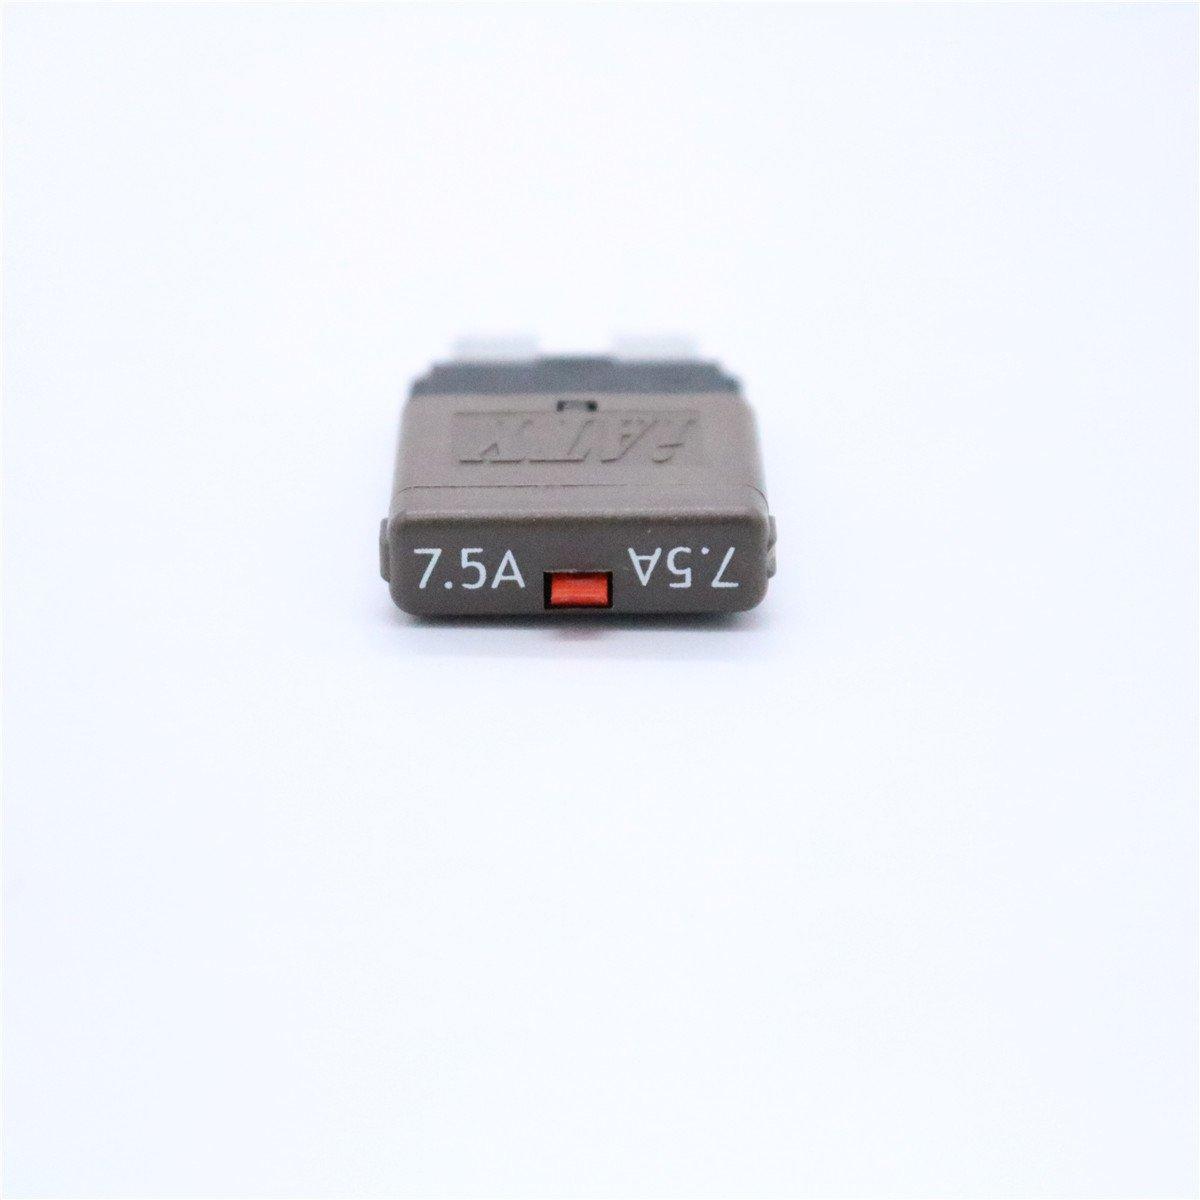 WINOMO 7.5AMP Reset Blade Fuse 28VDC Circuit Breaker Trip Fuses for Rv Truck